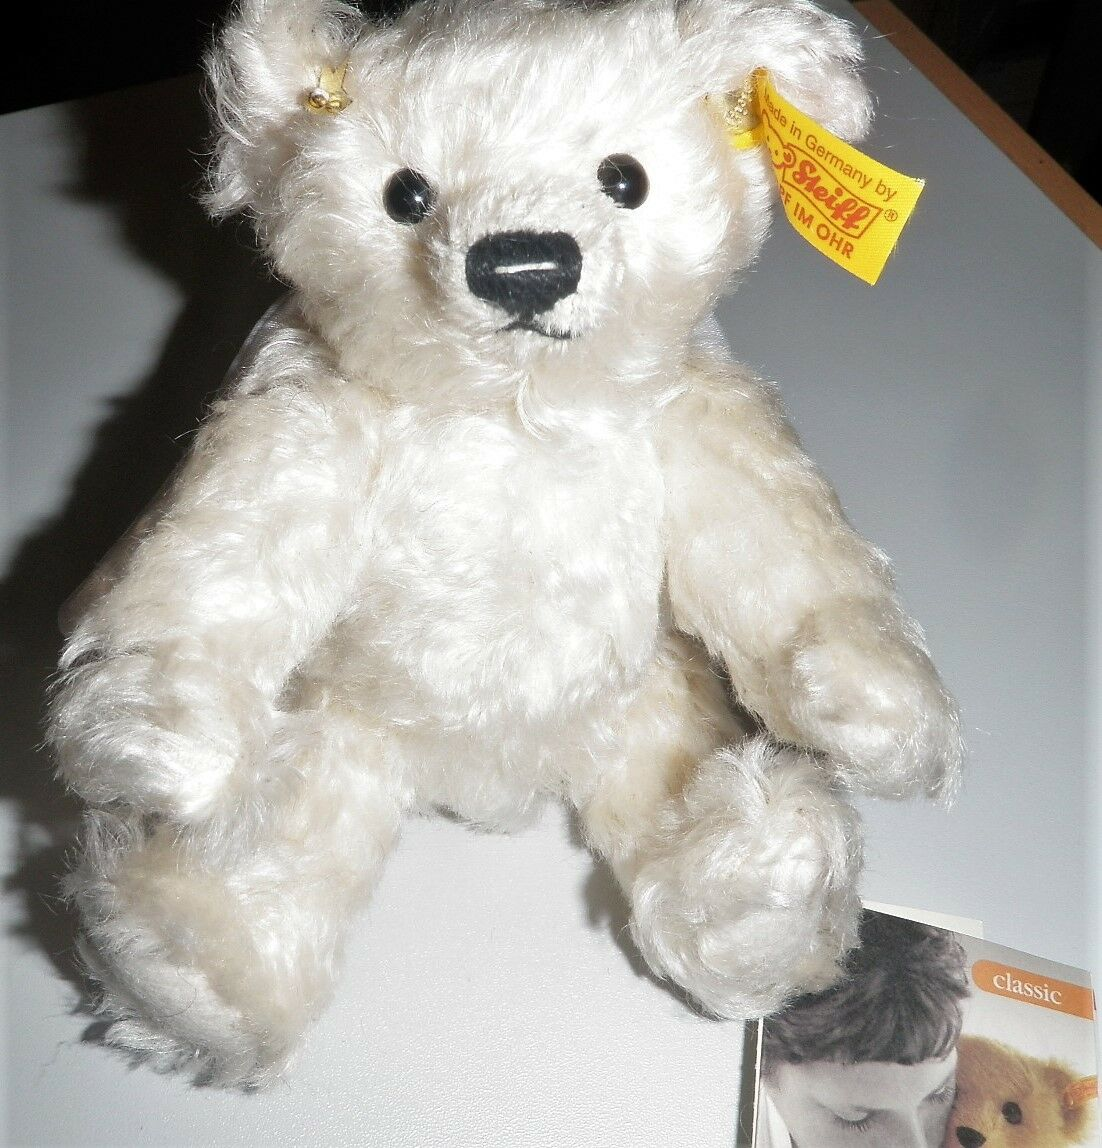 Steiff Teddybär Schutzengel 028496 weiß 18 cm - Der hilft Besteimmt  - Geschenk -